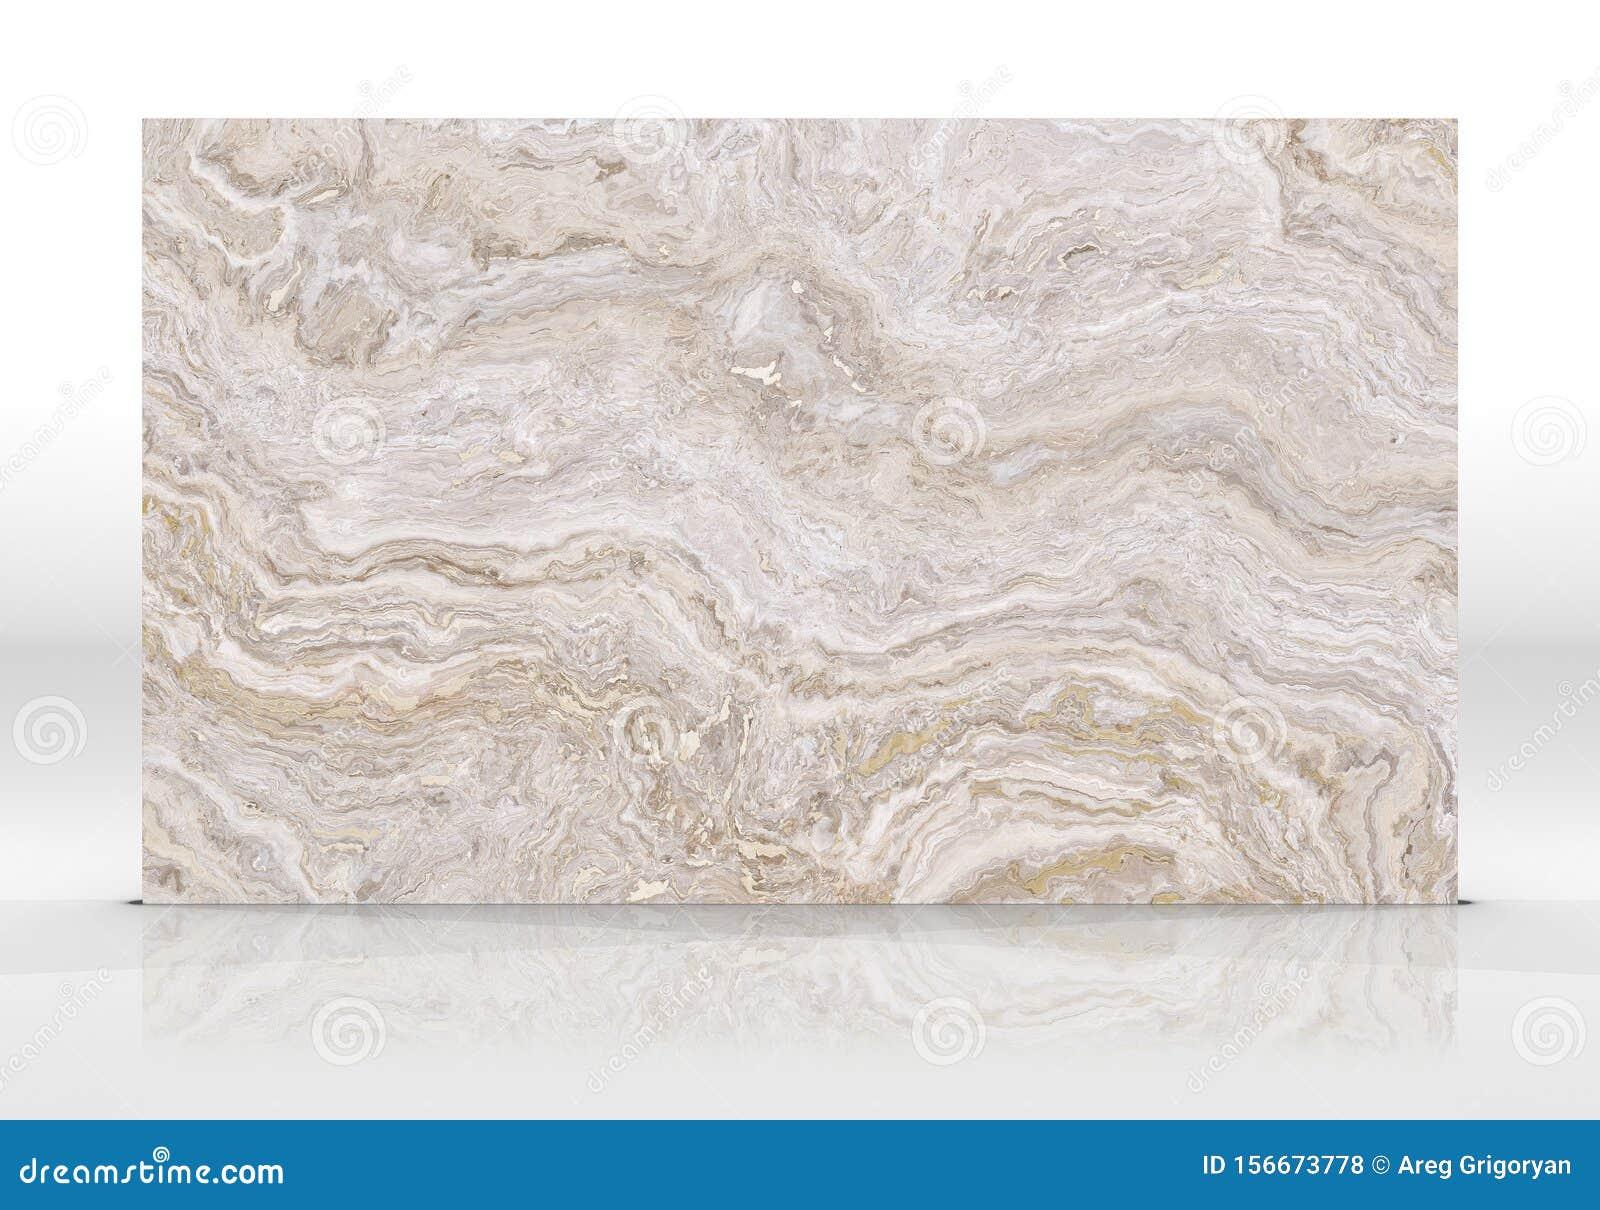 Travertine Marble Tile Texture Stock Photo Image Of Grey Beige 156673778